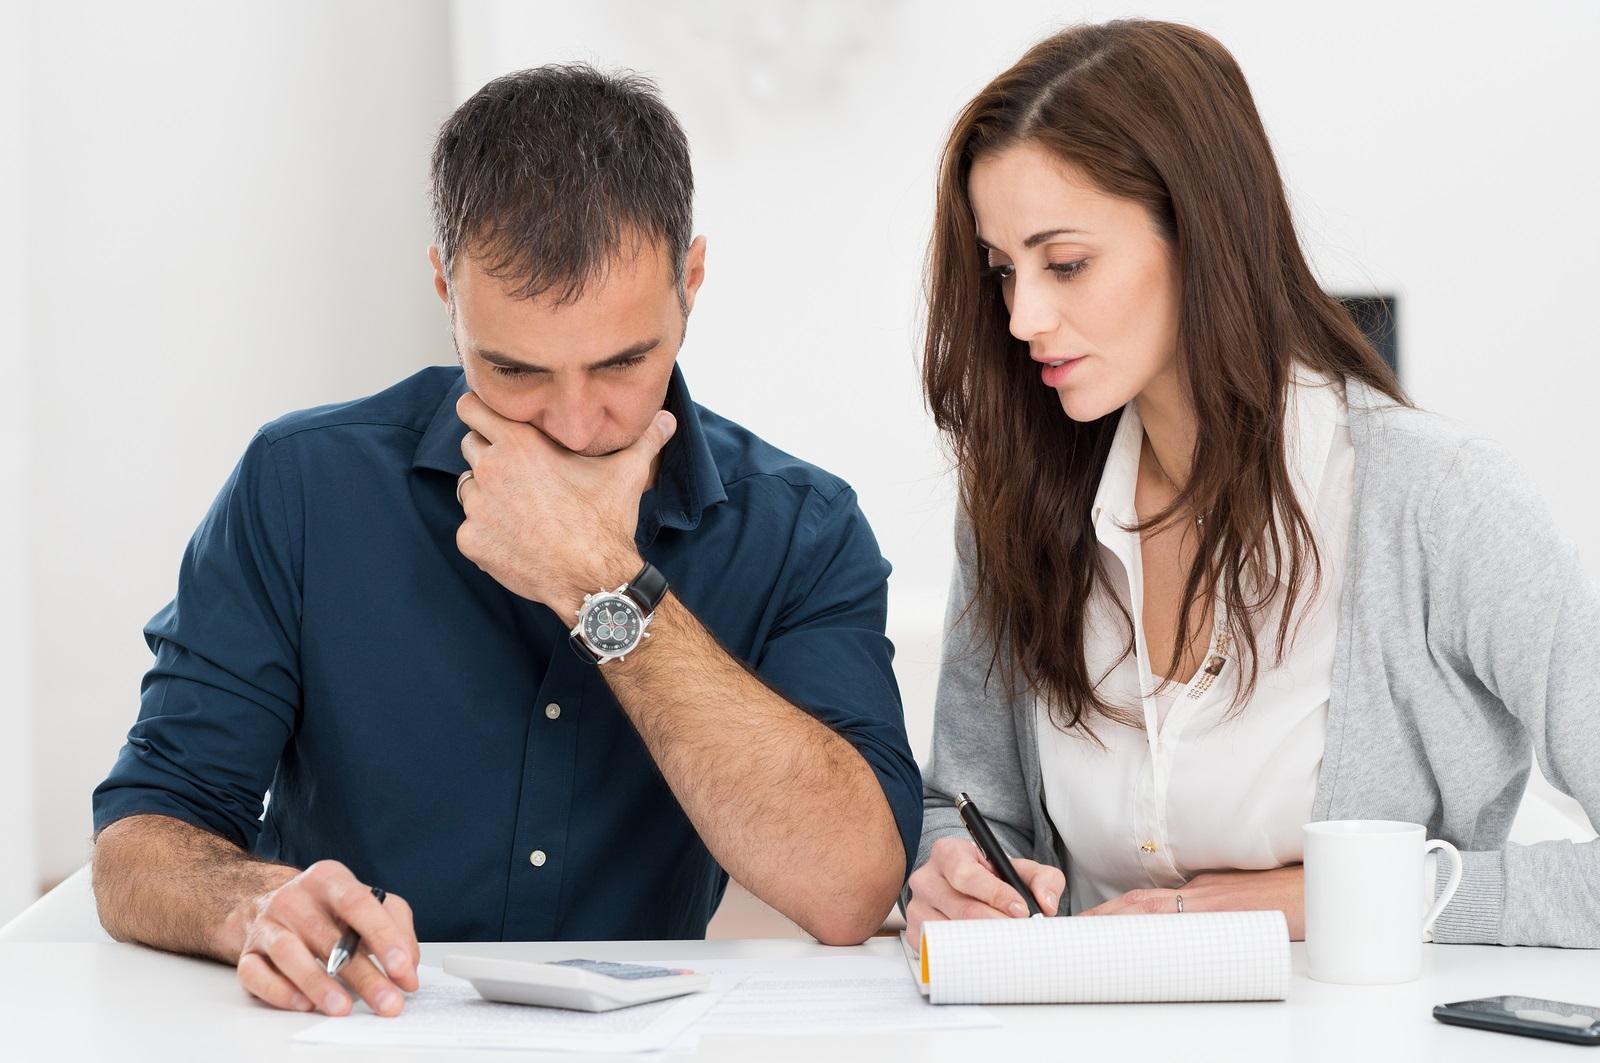 #Budgeting - Useful Money Saving Tips #finance #FrizeMedia